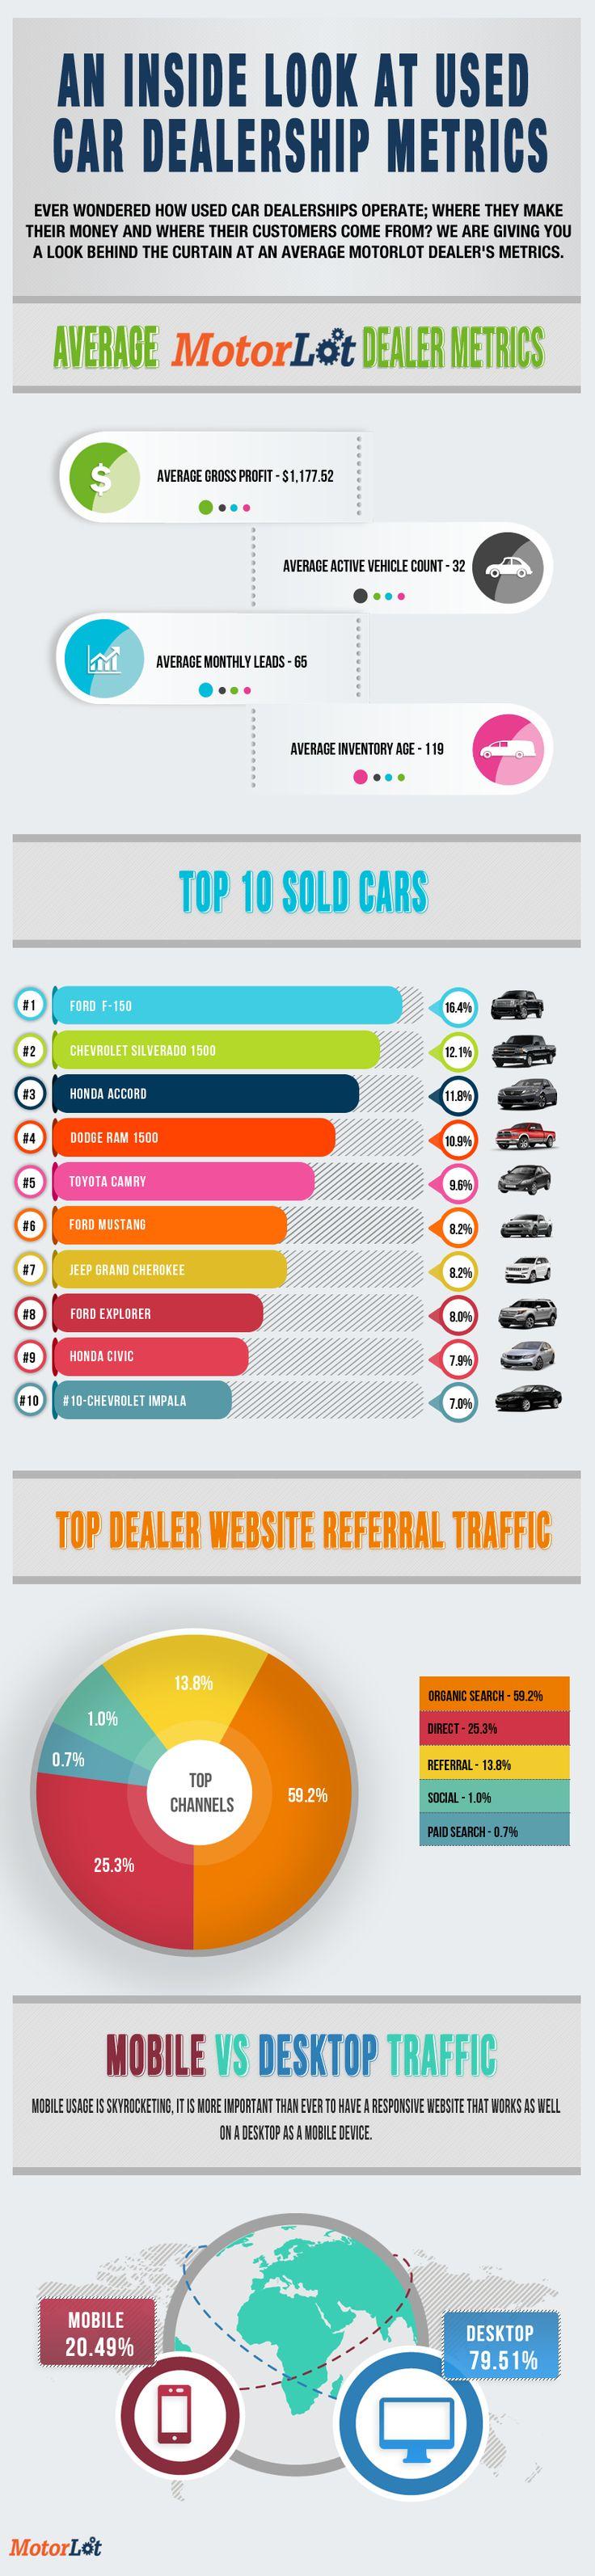 An Inside Look At Used Car Dealership Metrics